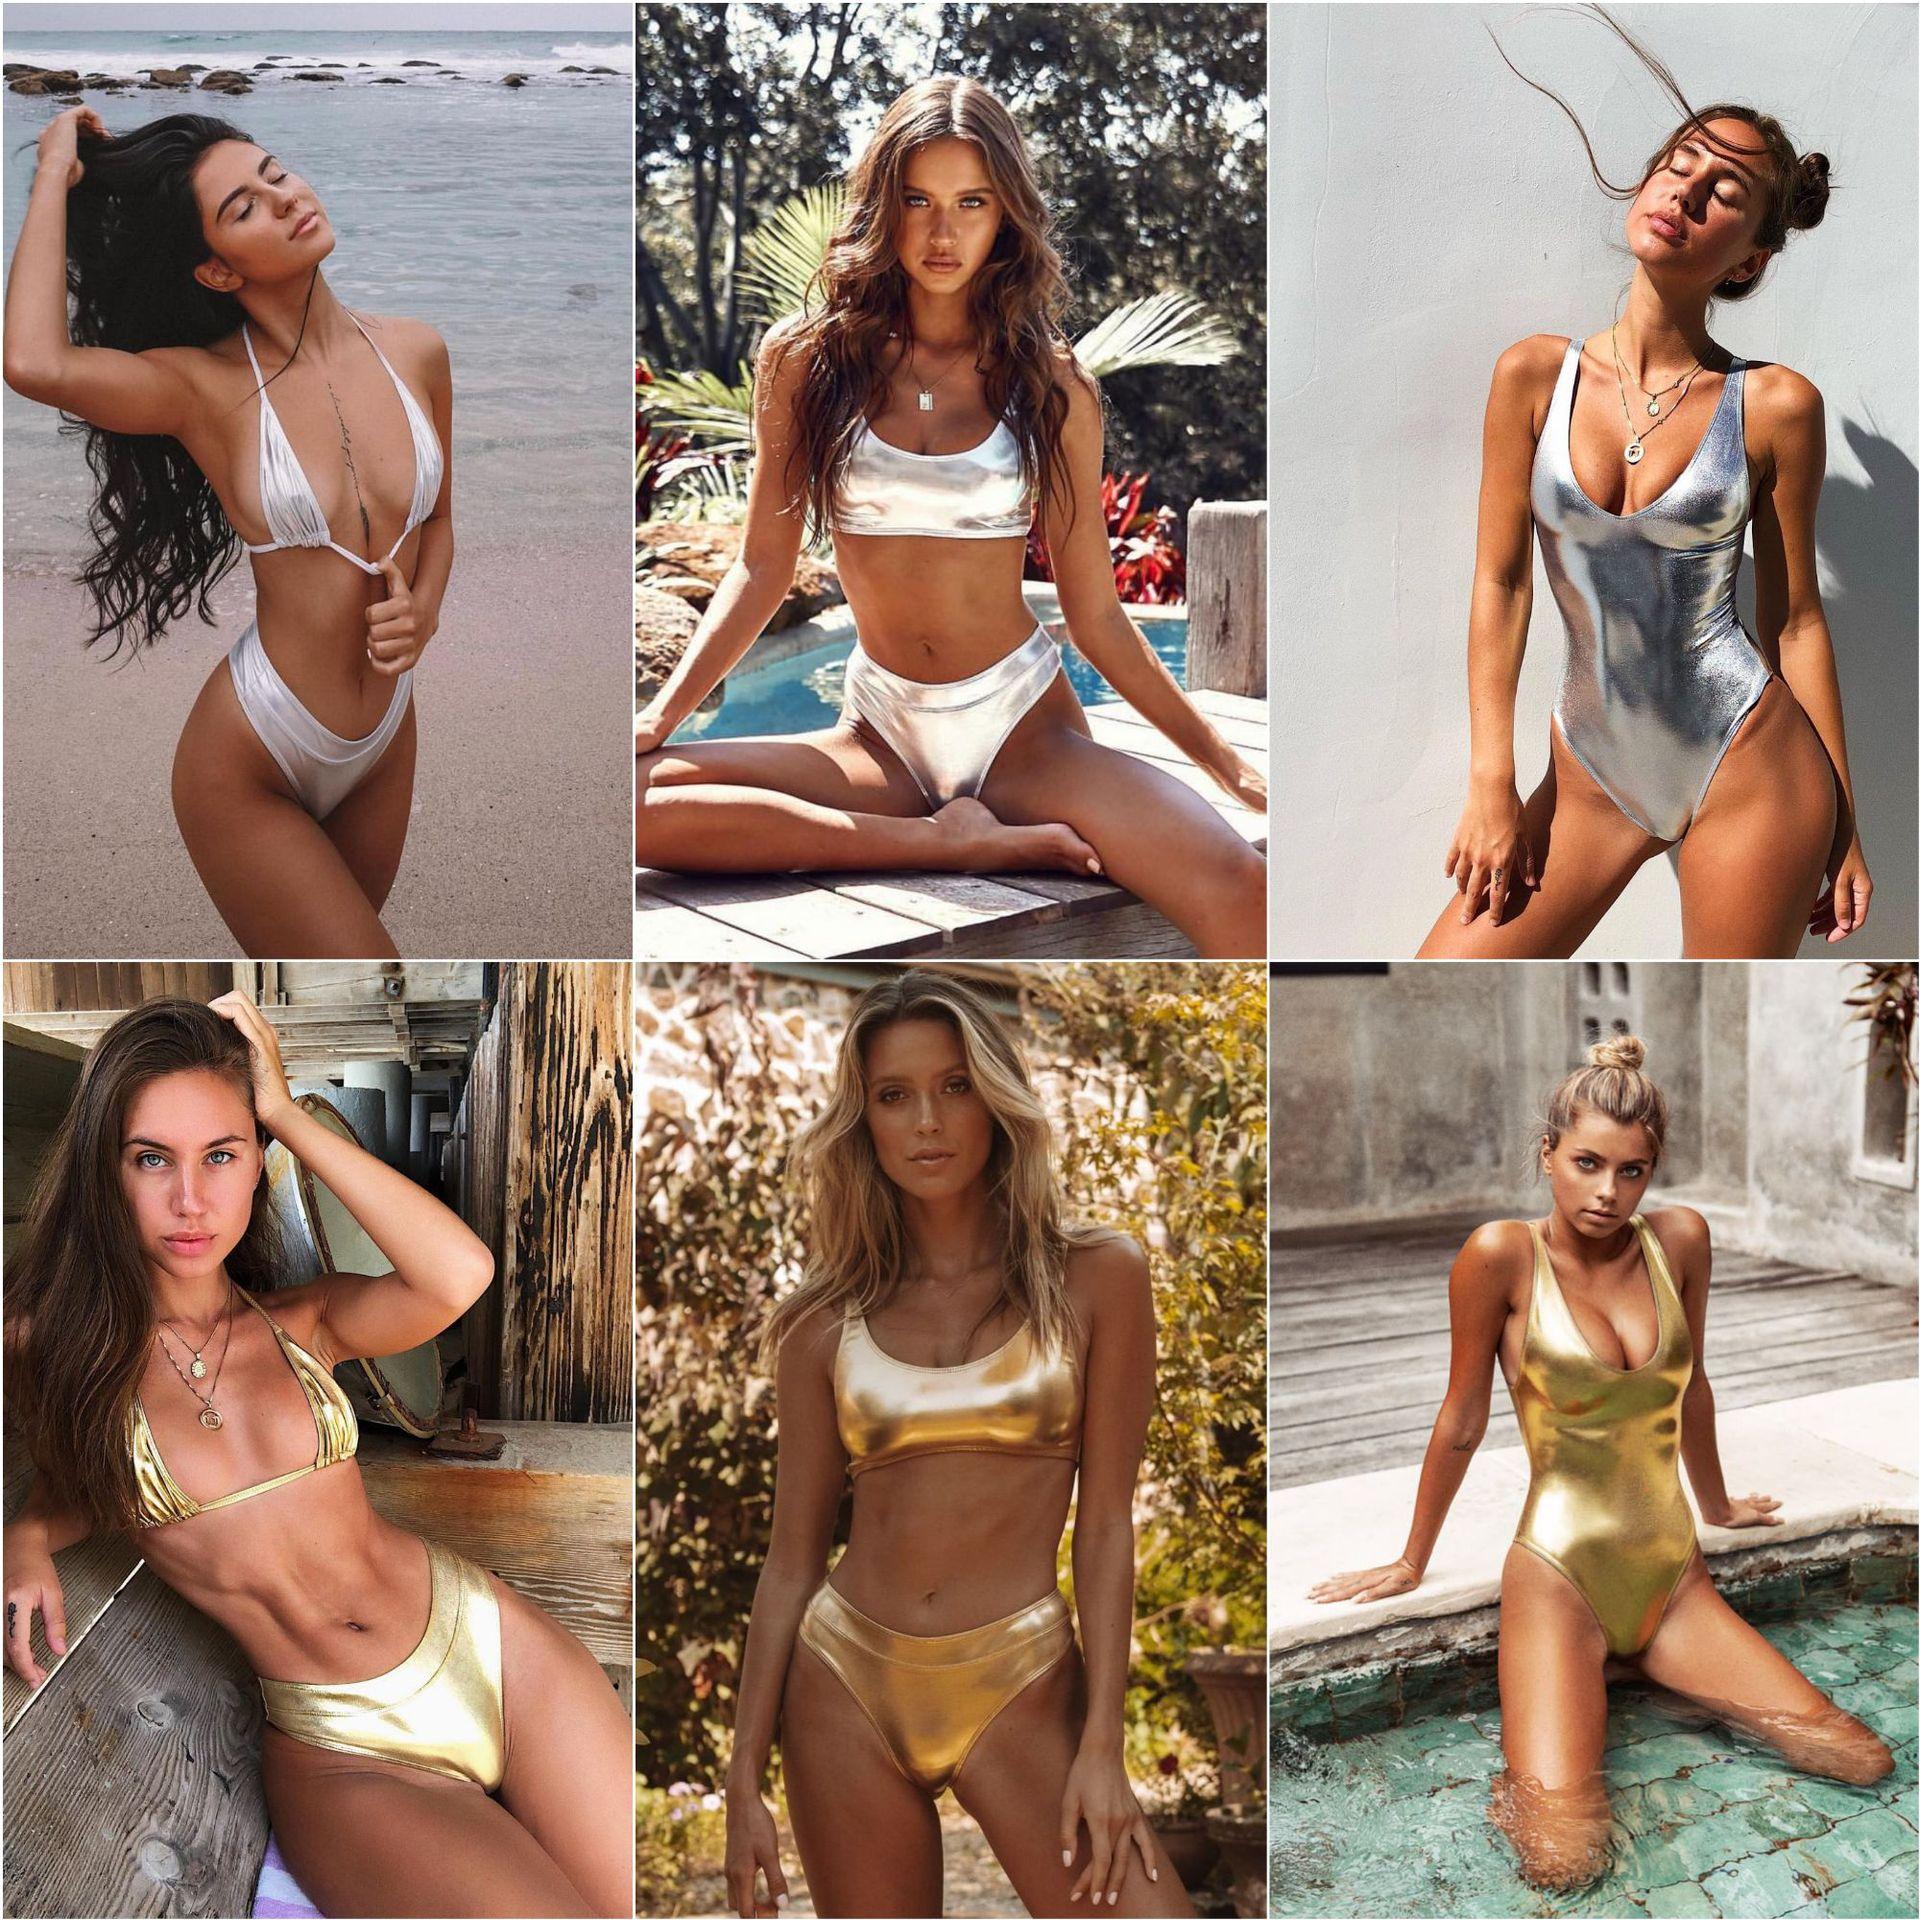 Biquíni feminino brasileiro estilo vintage, roupa de banho brilhante, dourada/prateada, metálico, para praia, maiô, moda praia